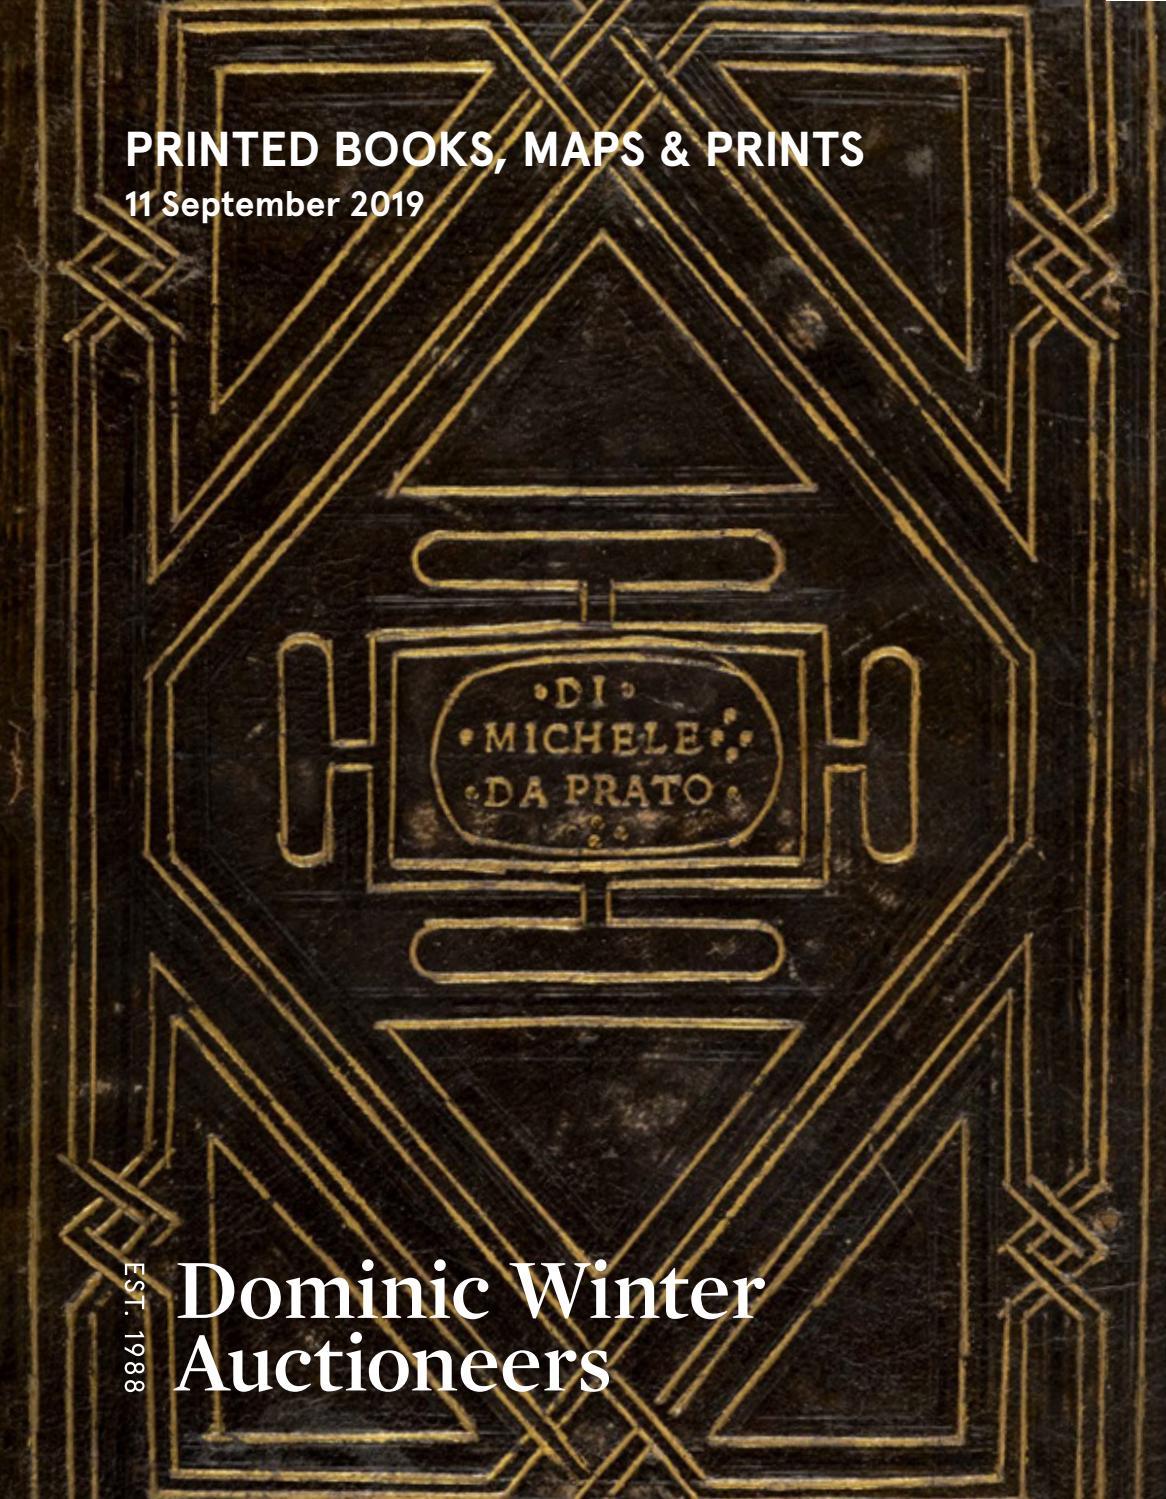 Fiori Bianchi 11 Lettere.Dominic Winter Auctioneers By Jamm Design Ltd Issuu